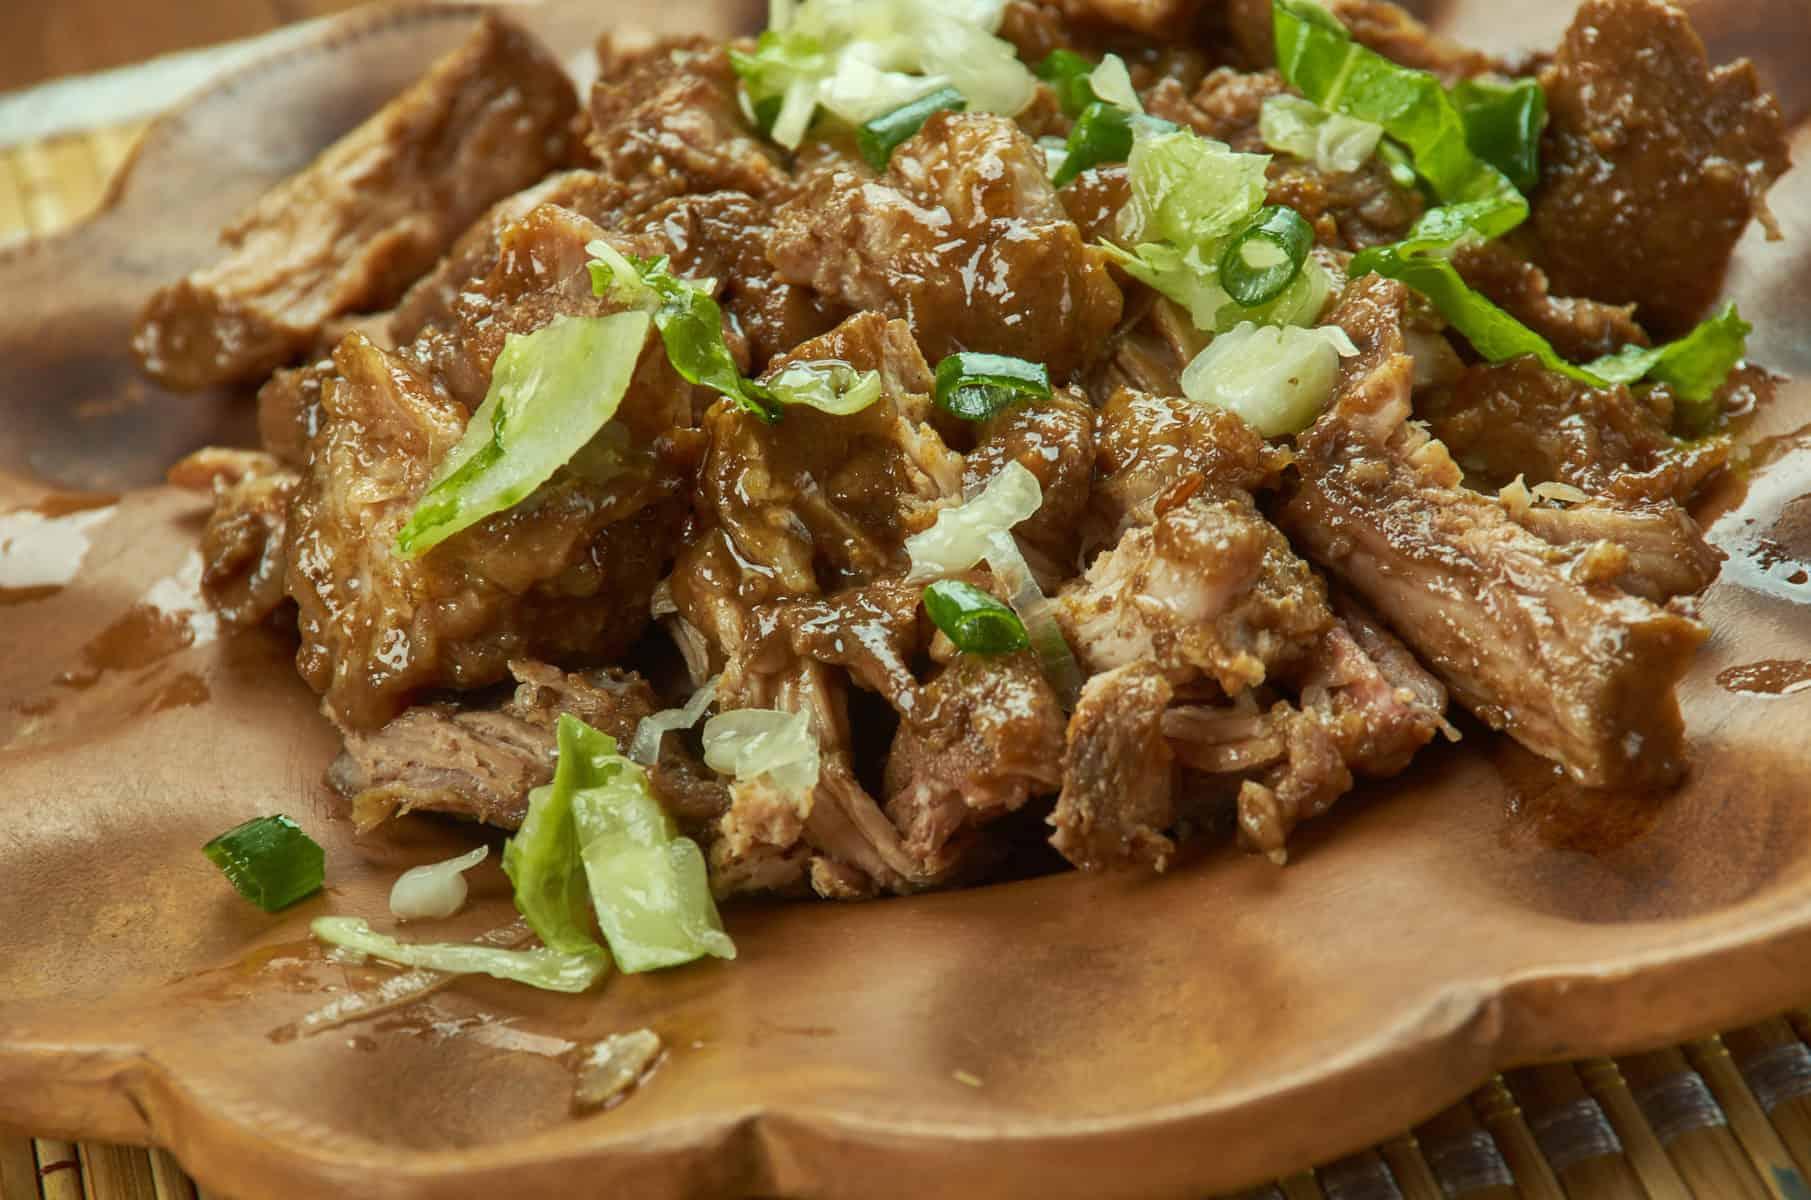 Carnitas - Mexican Slow Cooker Pulled Pork, Pork Carnitas